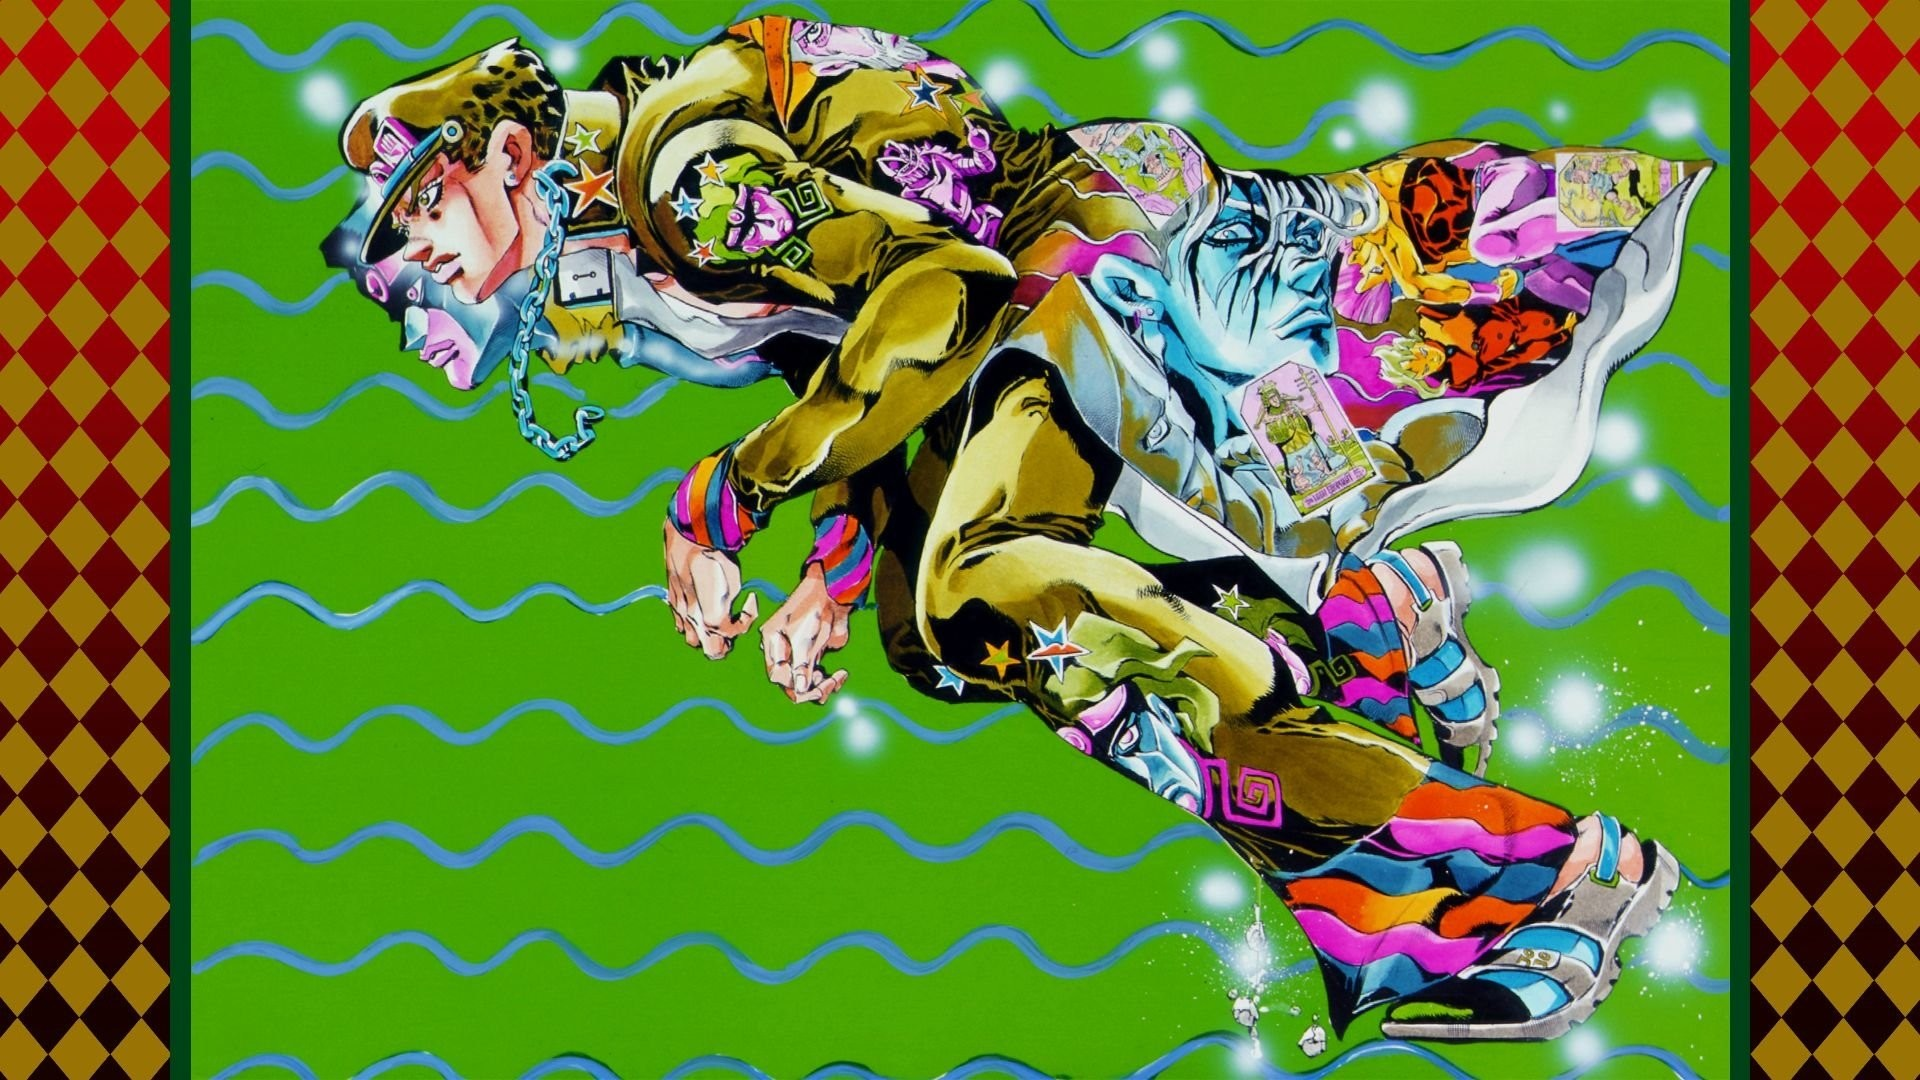 Jojo Bizarre Adventure Hd Wallpaper Wallpapertag